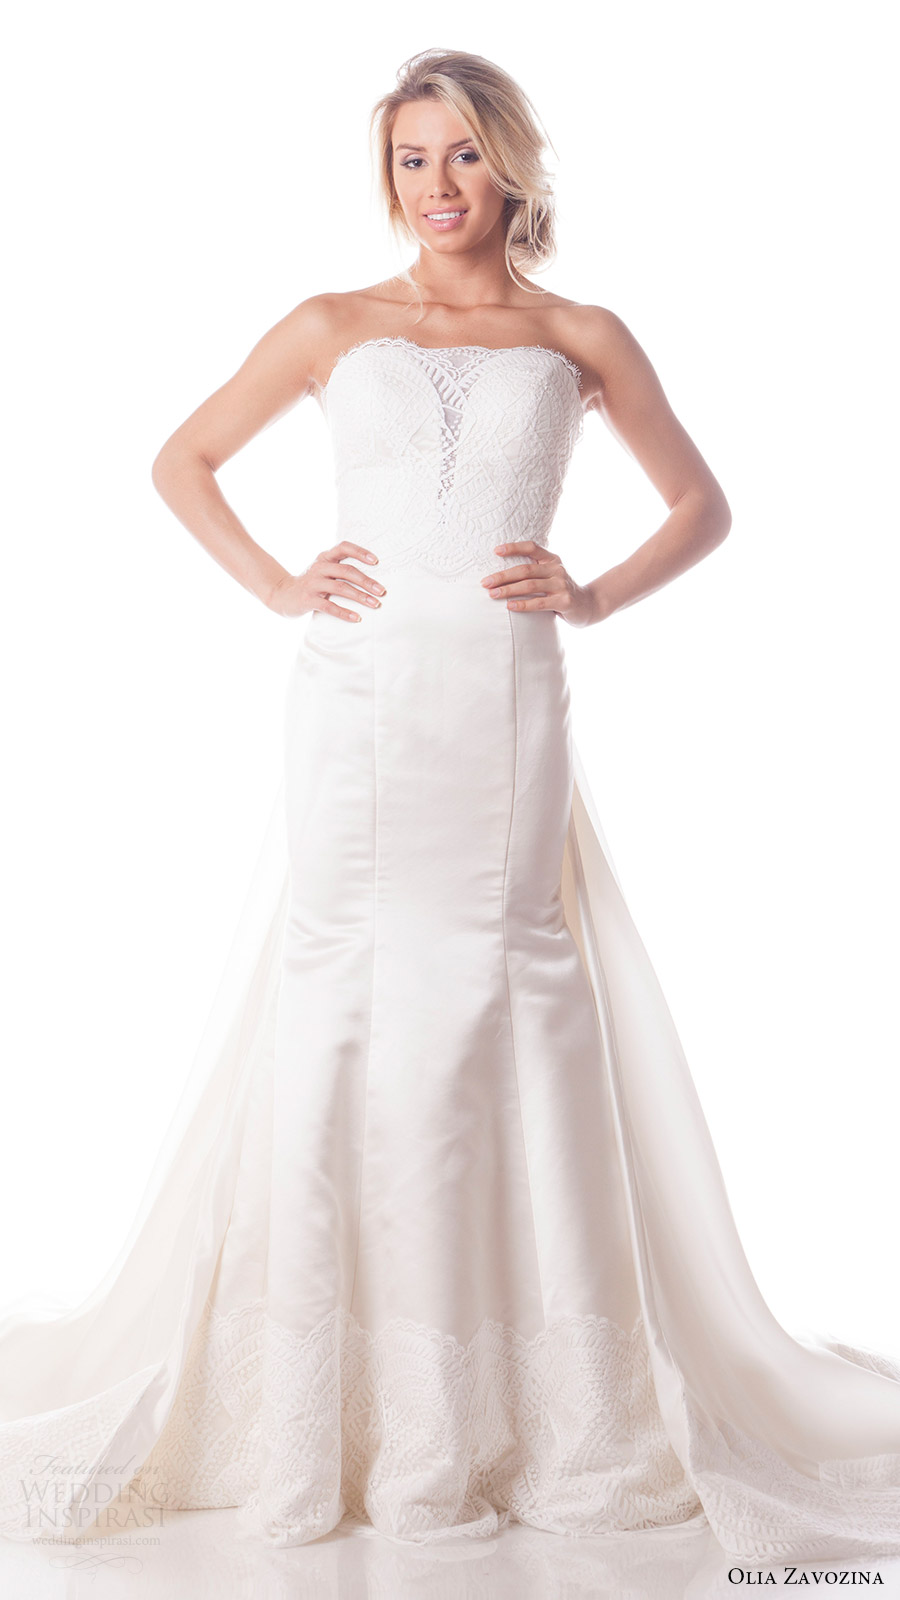 Sherri Hill Wedding Dresses 72 Cool Olia Zavozina Spring Wedding